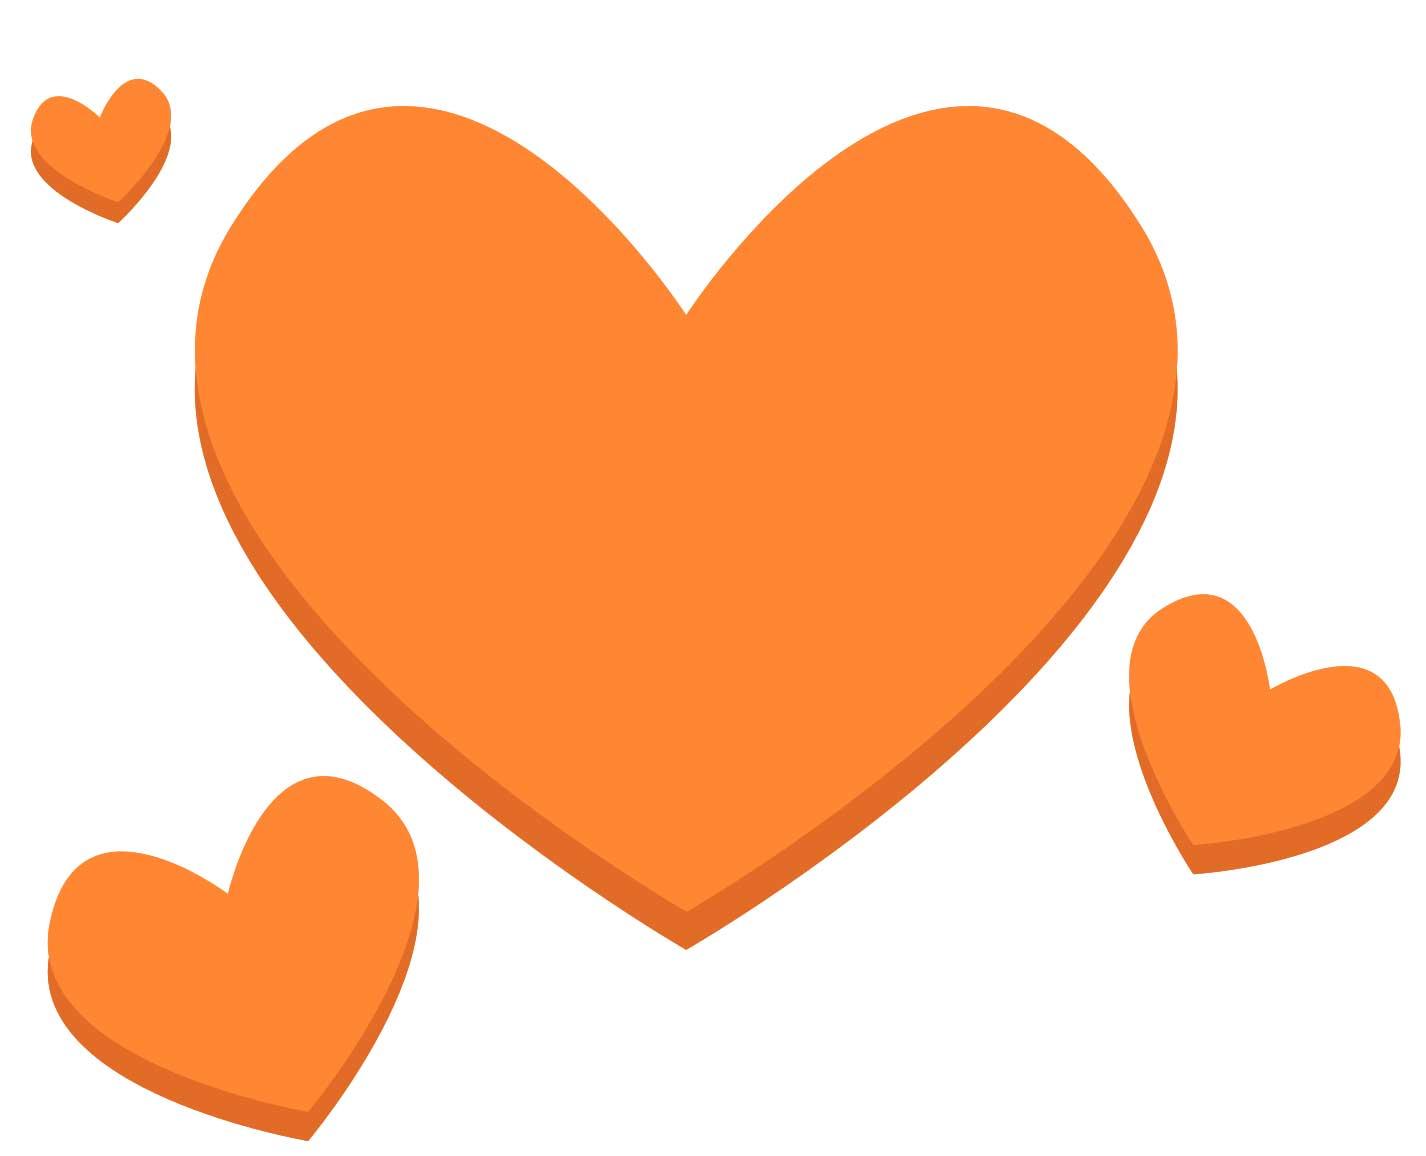 Best Heart Whatsapp DP Picvtures